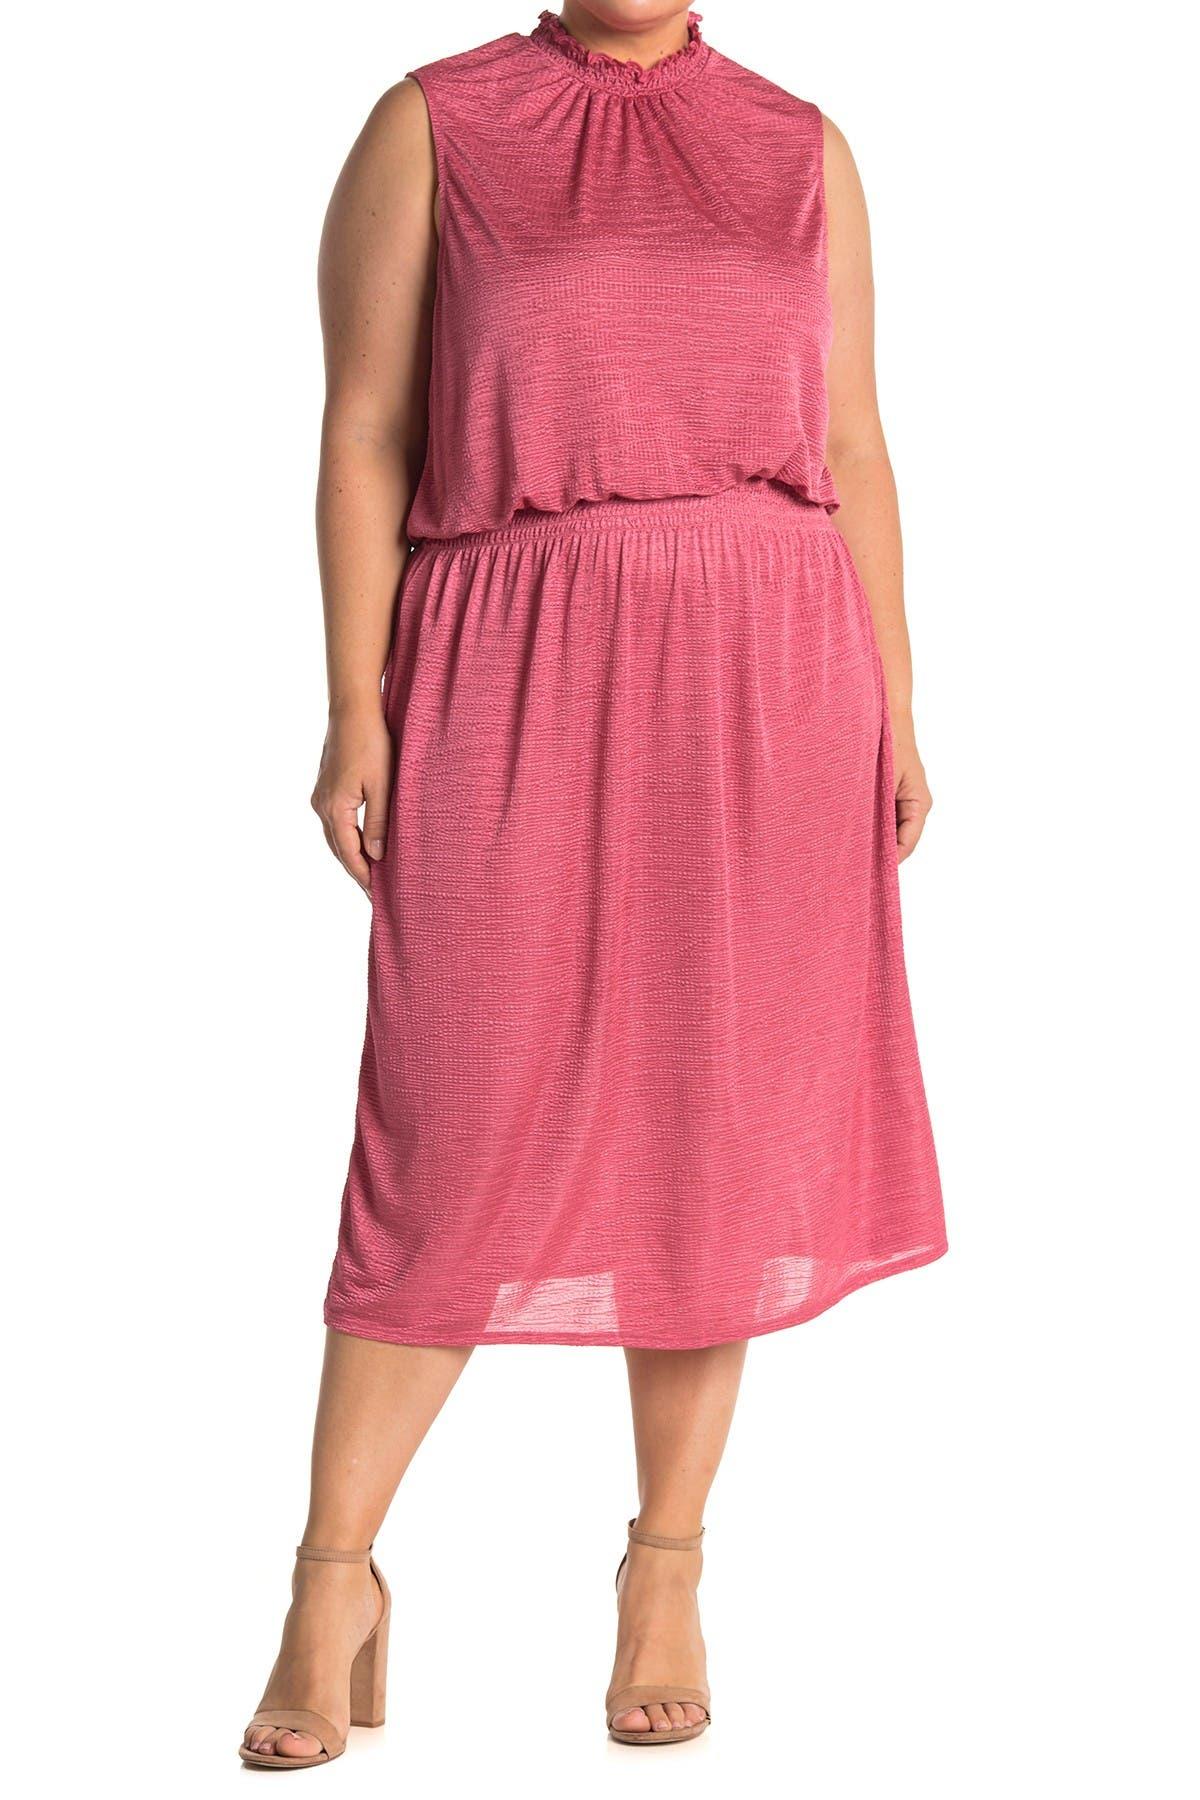 Image of Leota Samantha Smocked Sleeveless Midi Dress